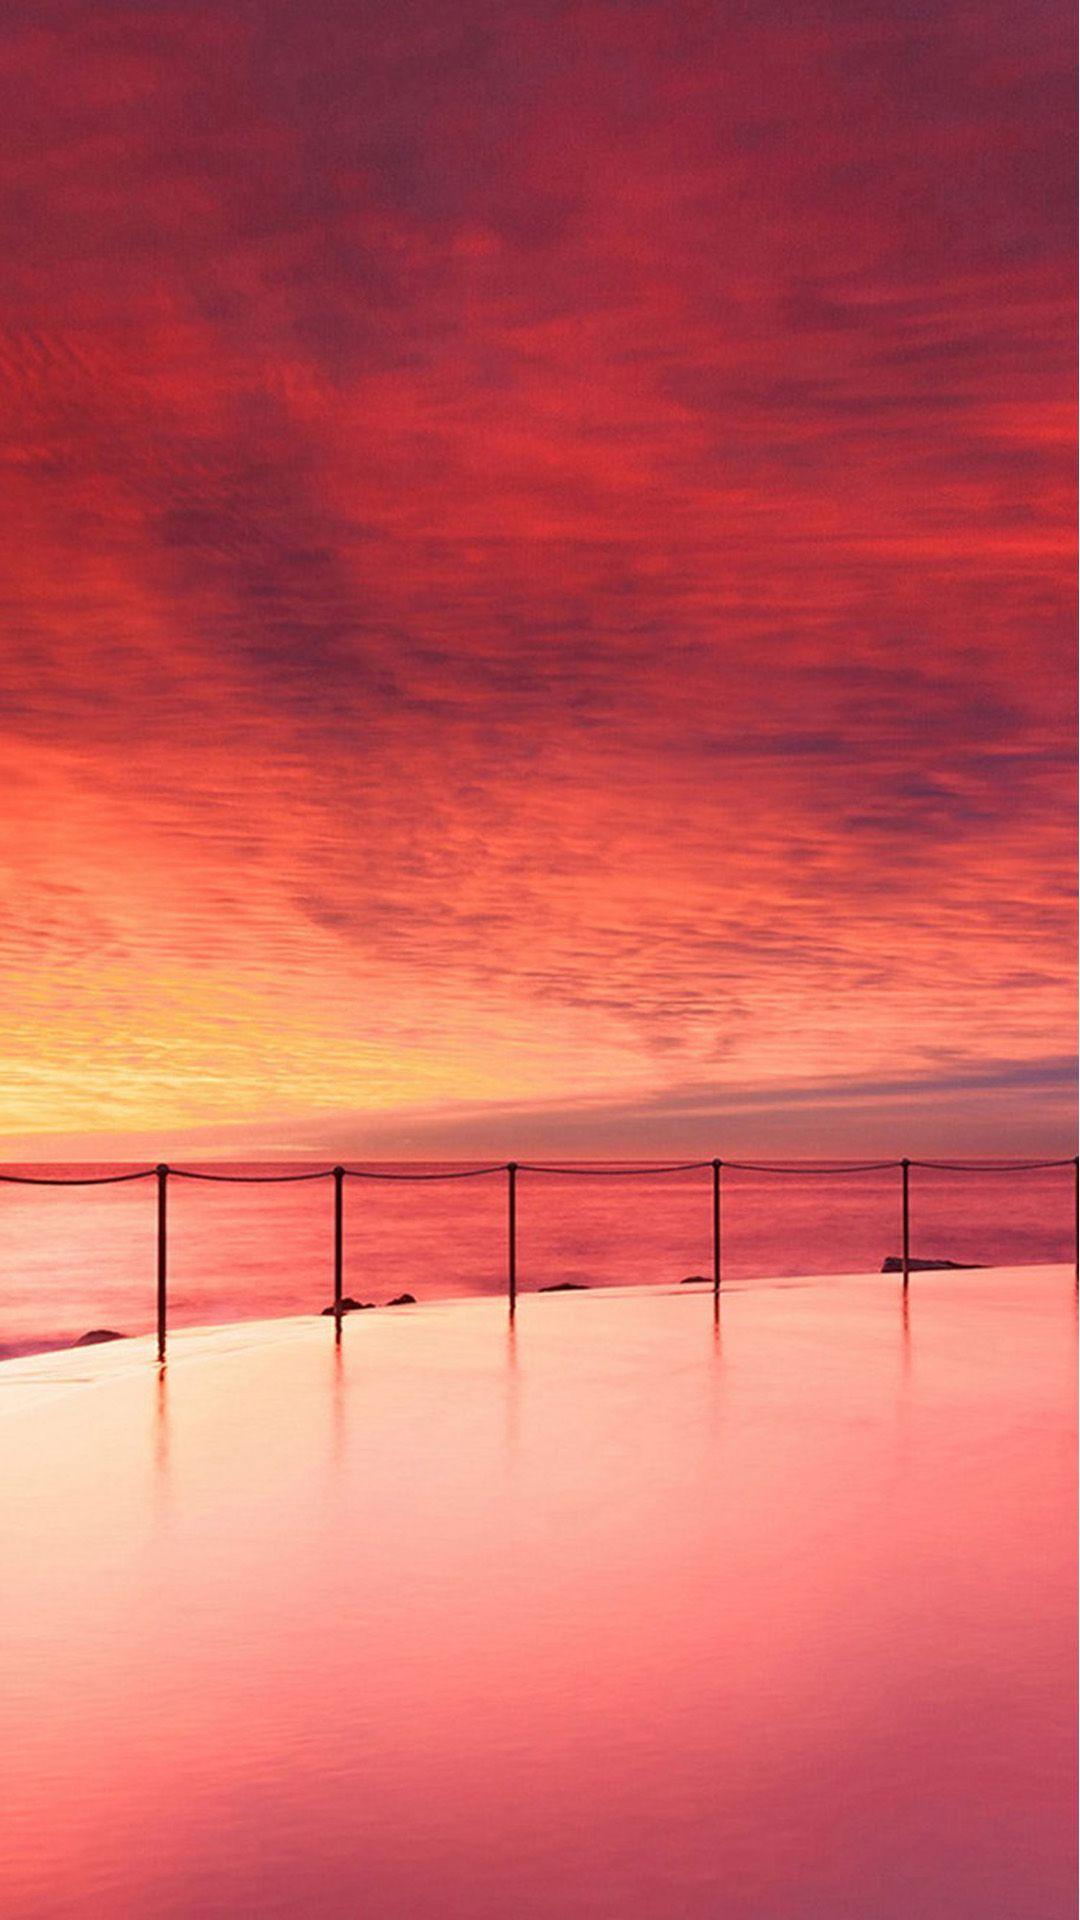 Wonderful Sunset Beautiful Beach Skyscape IPhone 6 Wallpaper